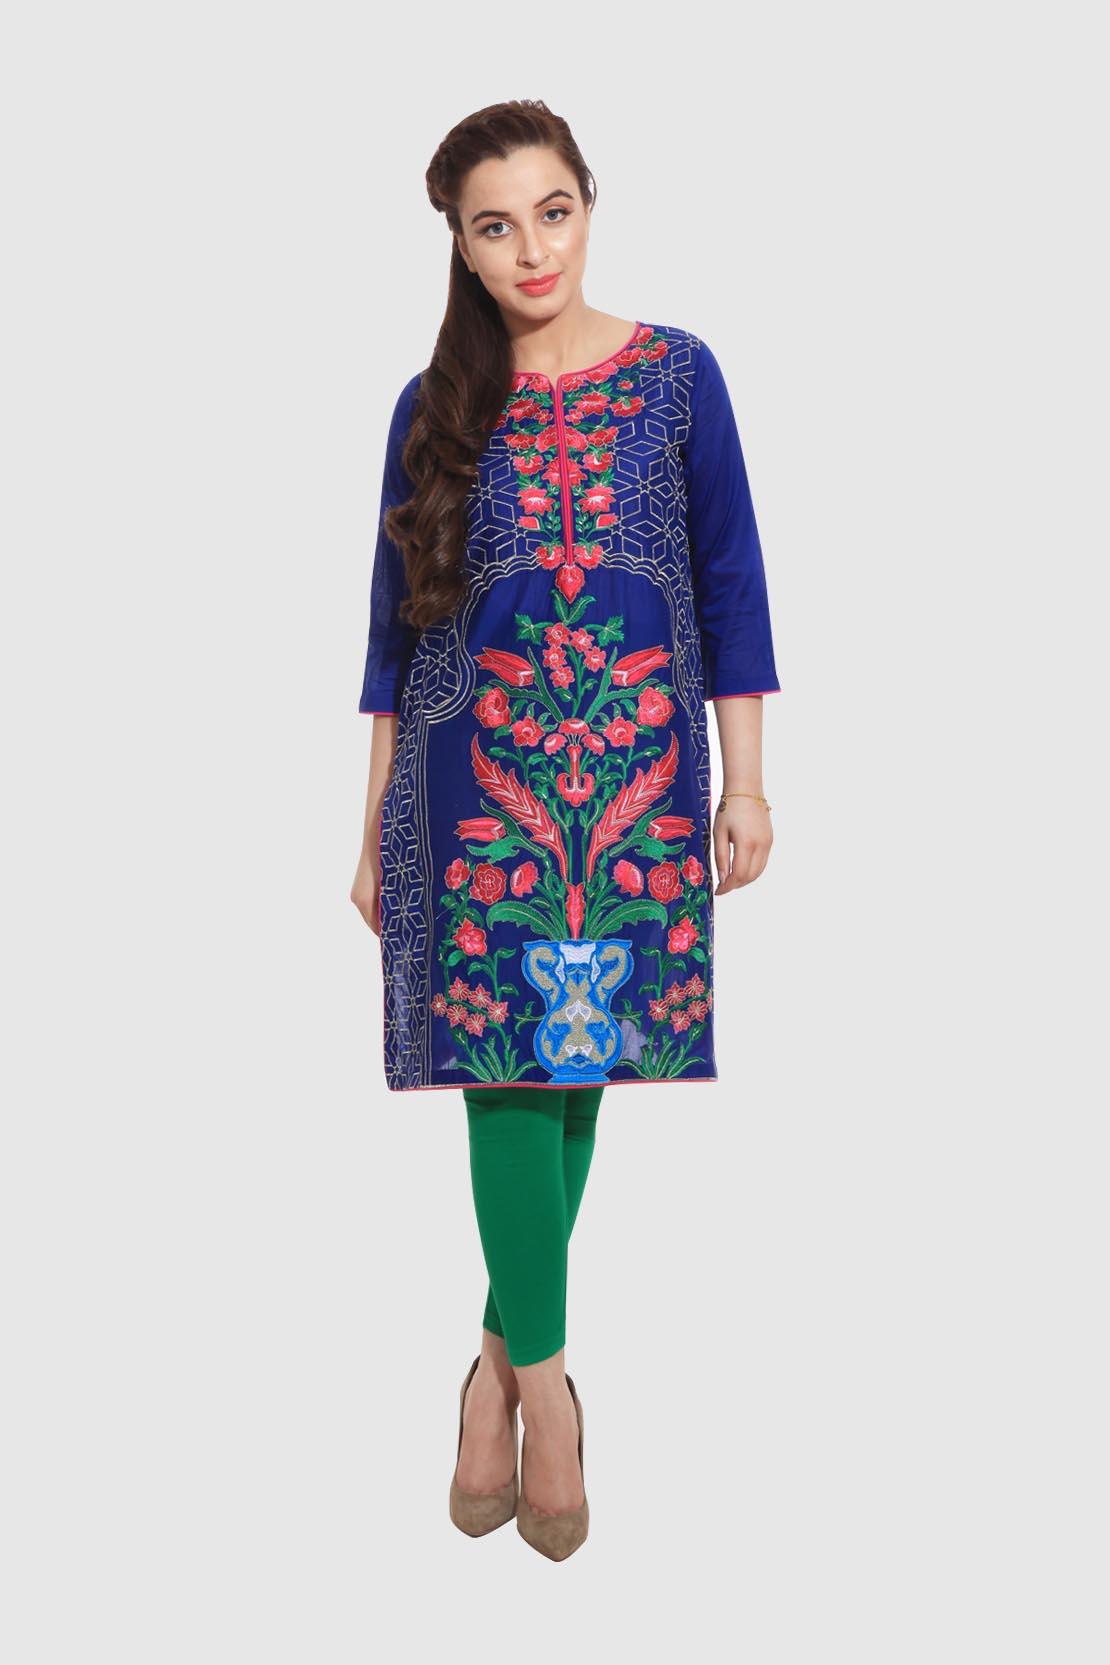 Rang ja formal eid dresses lawn collection 2016 - Rang Ja Trendy Eid Colorful Kurti Dresses 2017 2018 Collection